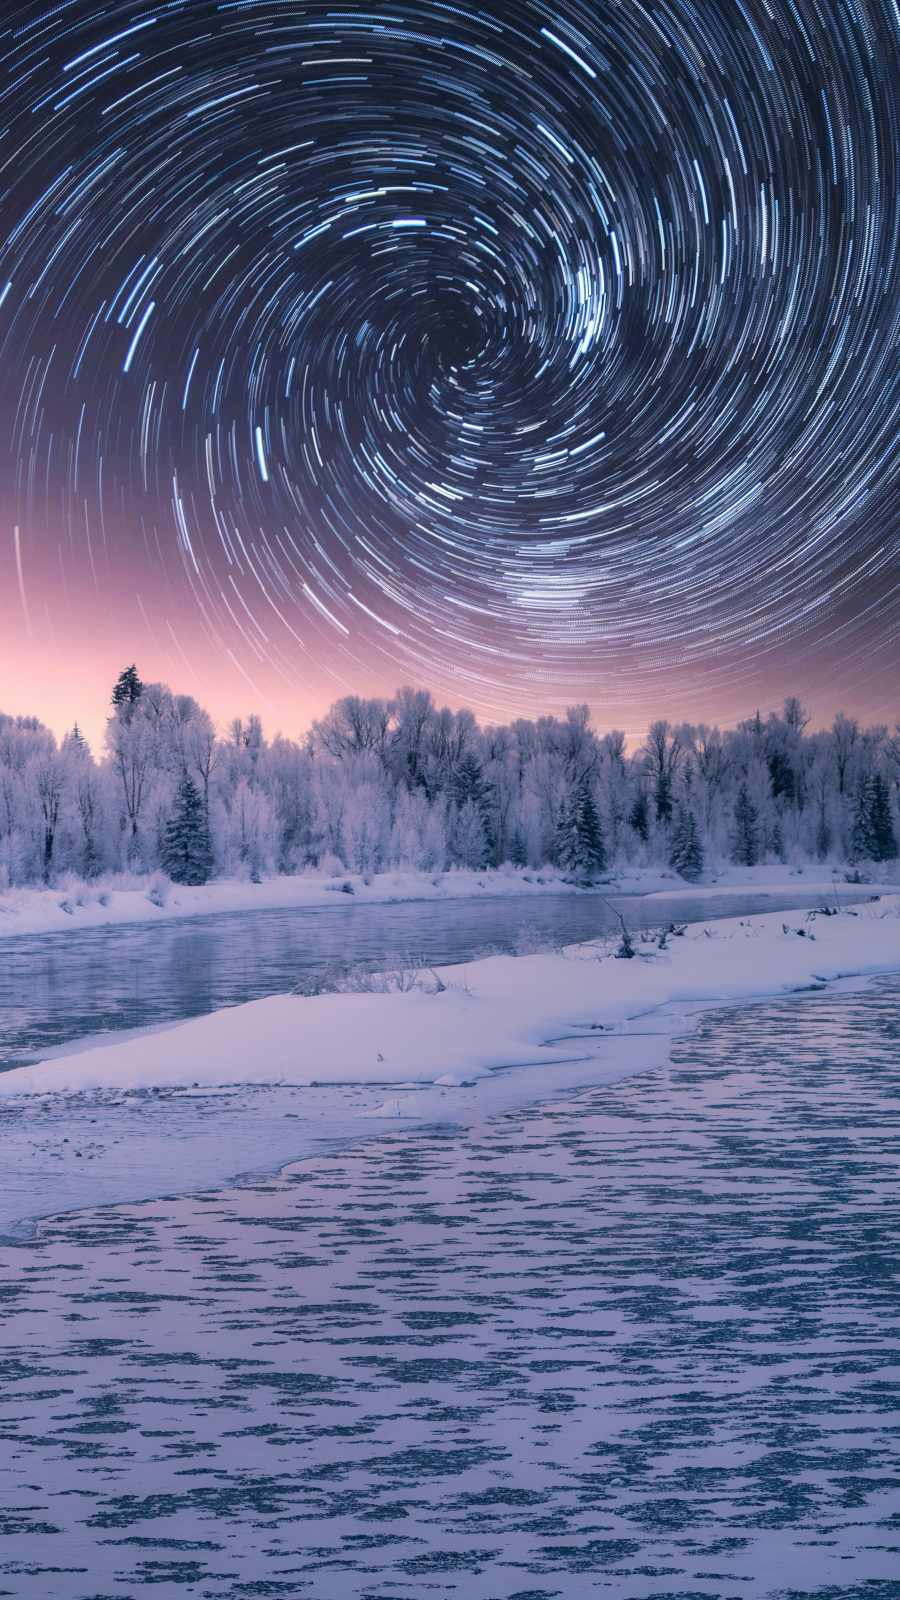 Spiral Sky Winter